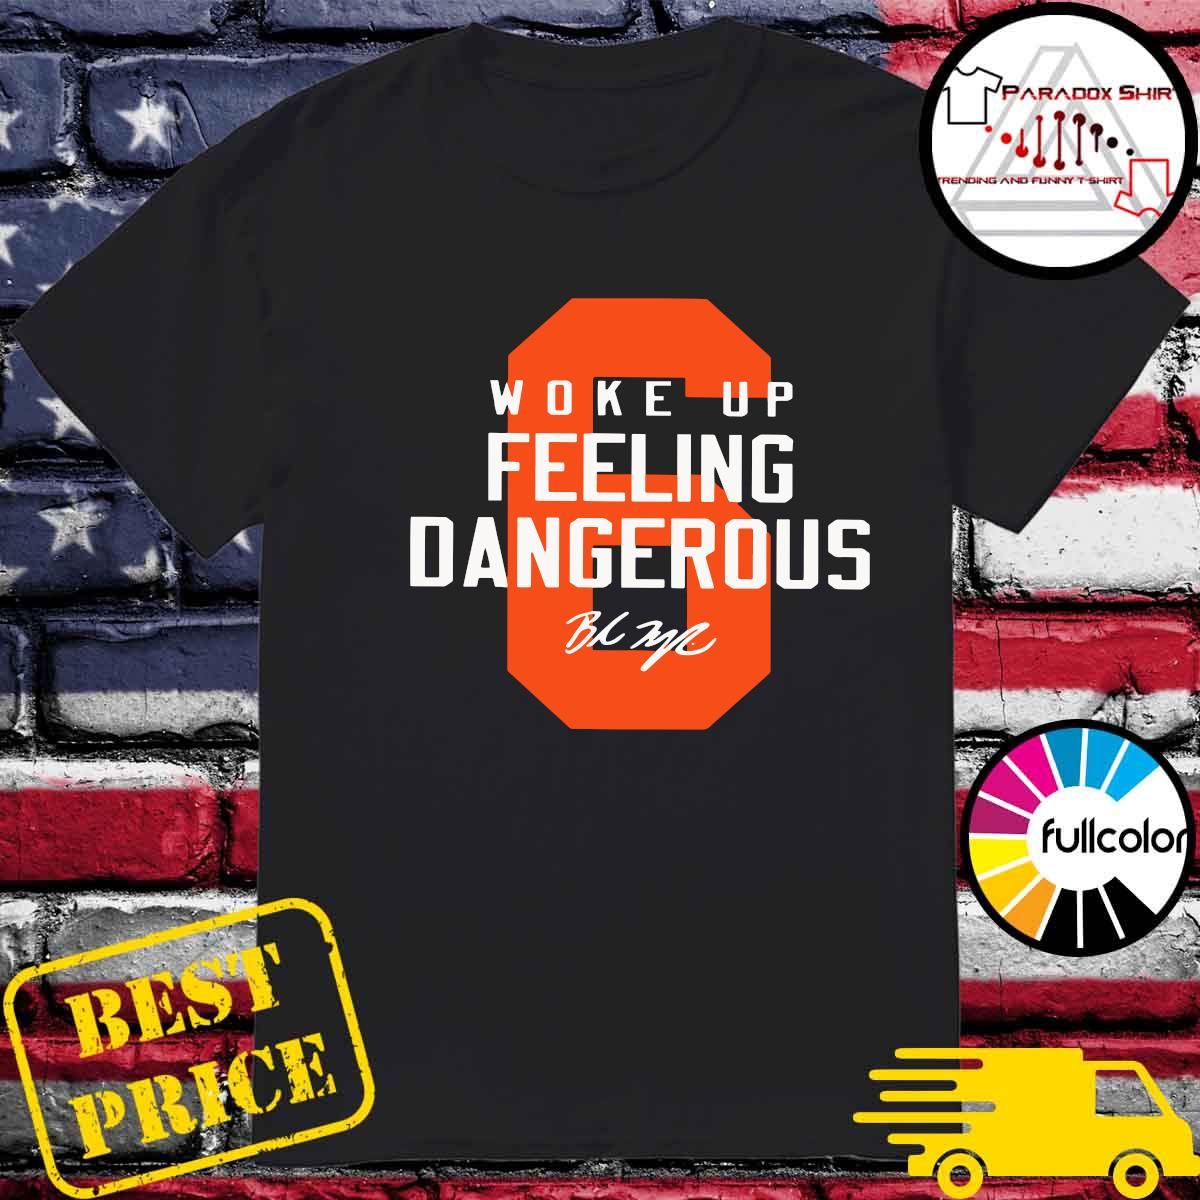 Baker Mayfield 6 Woke Up Feeling Dangerous Signature Shirt